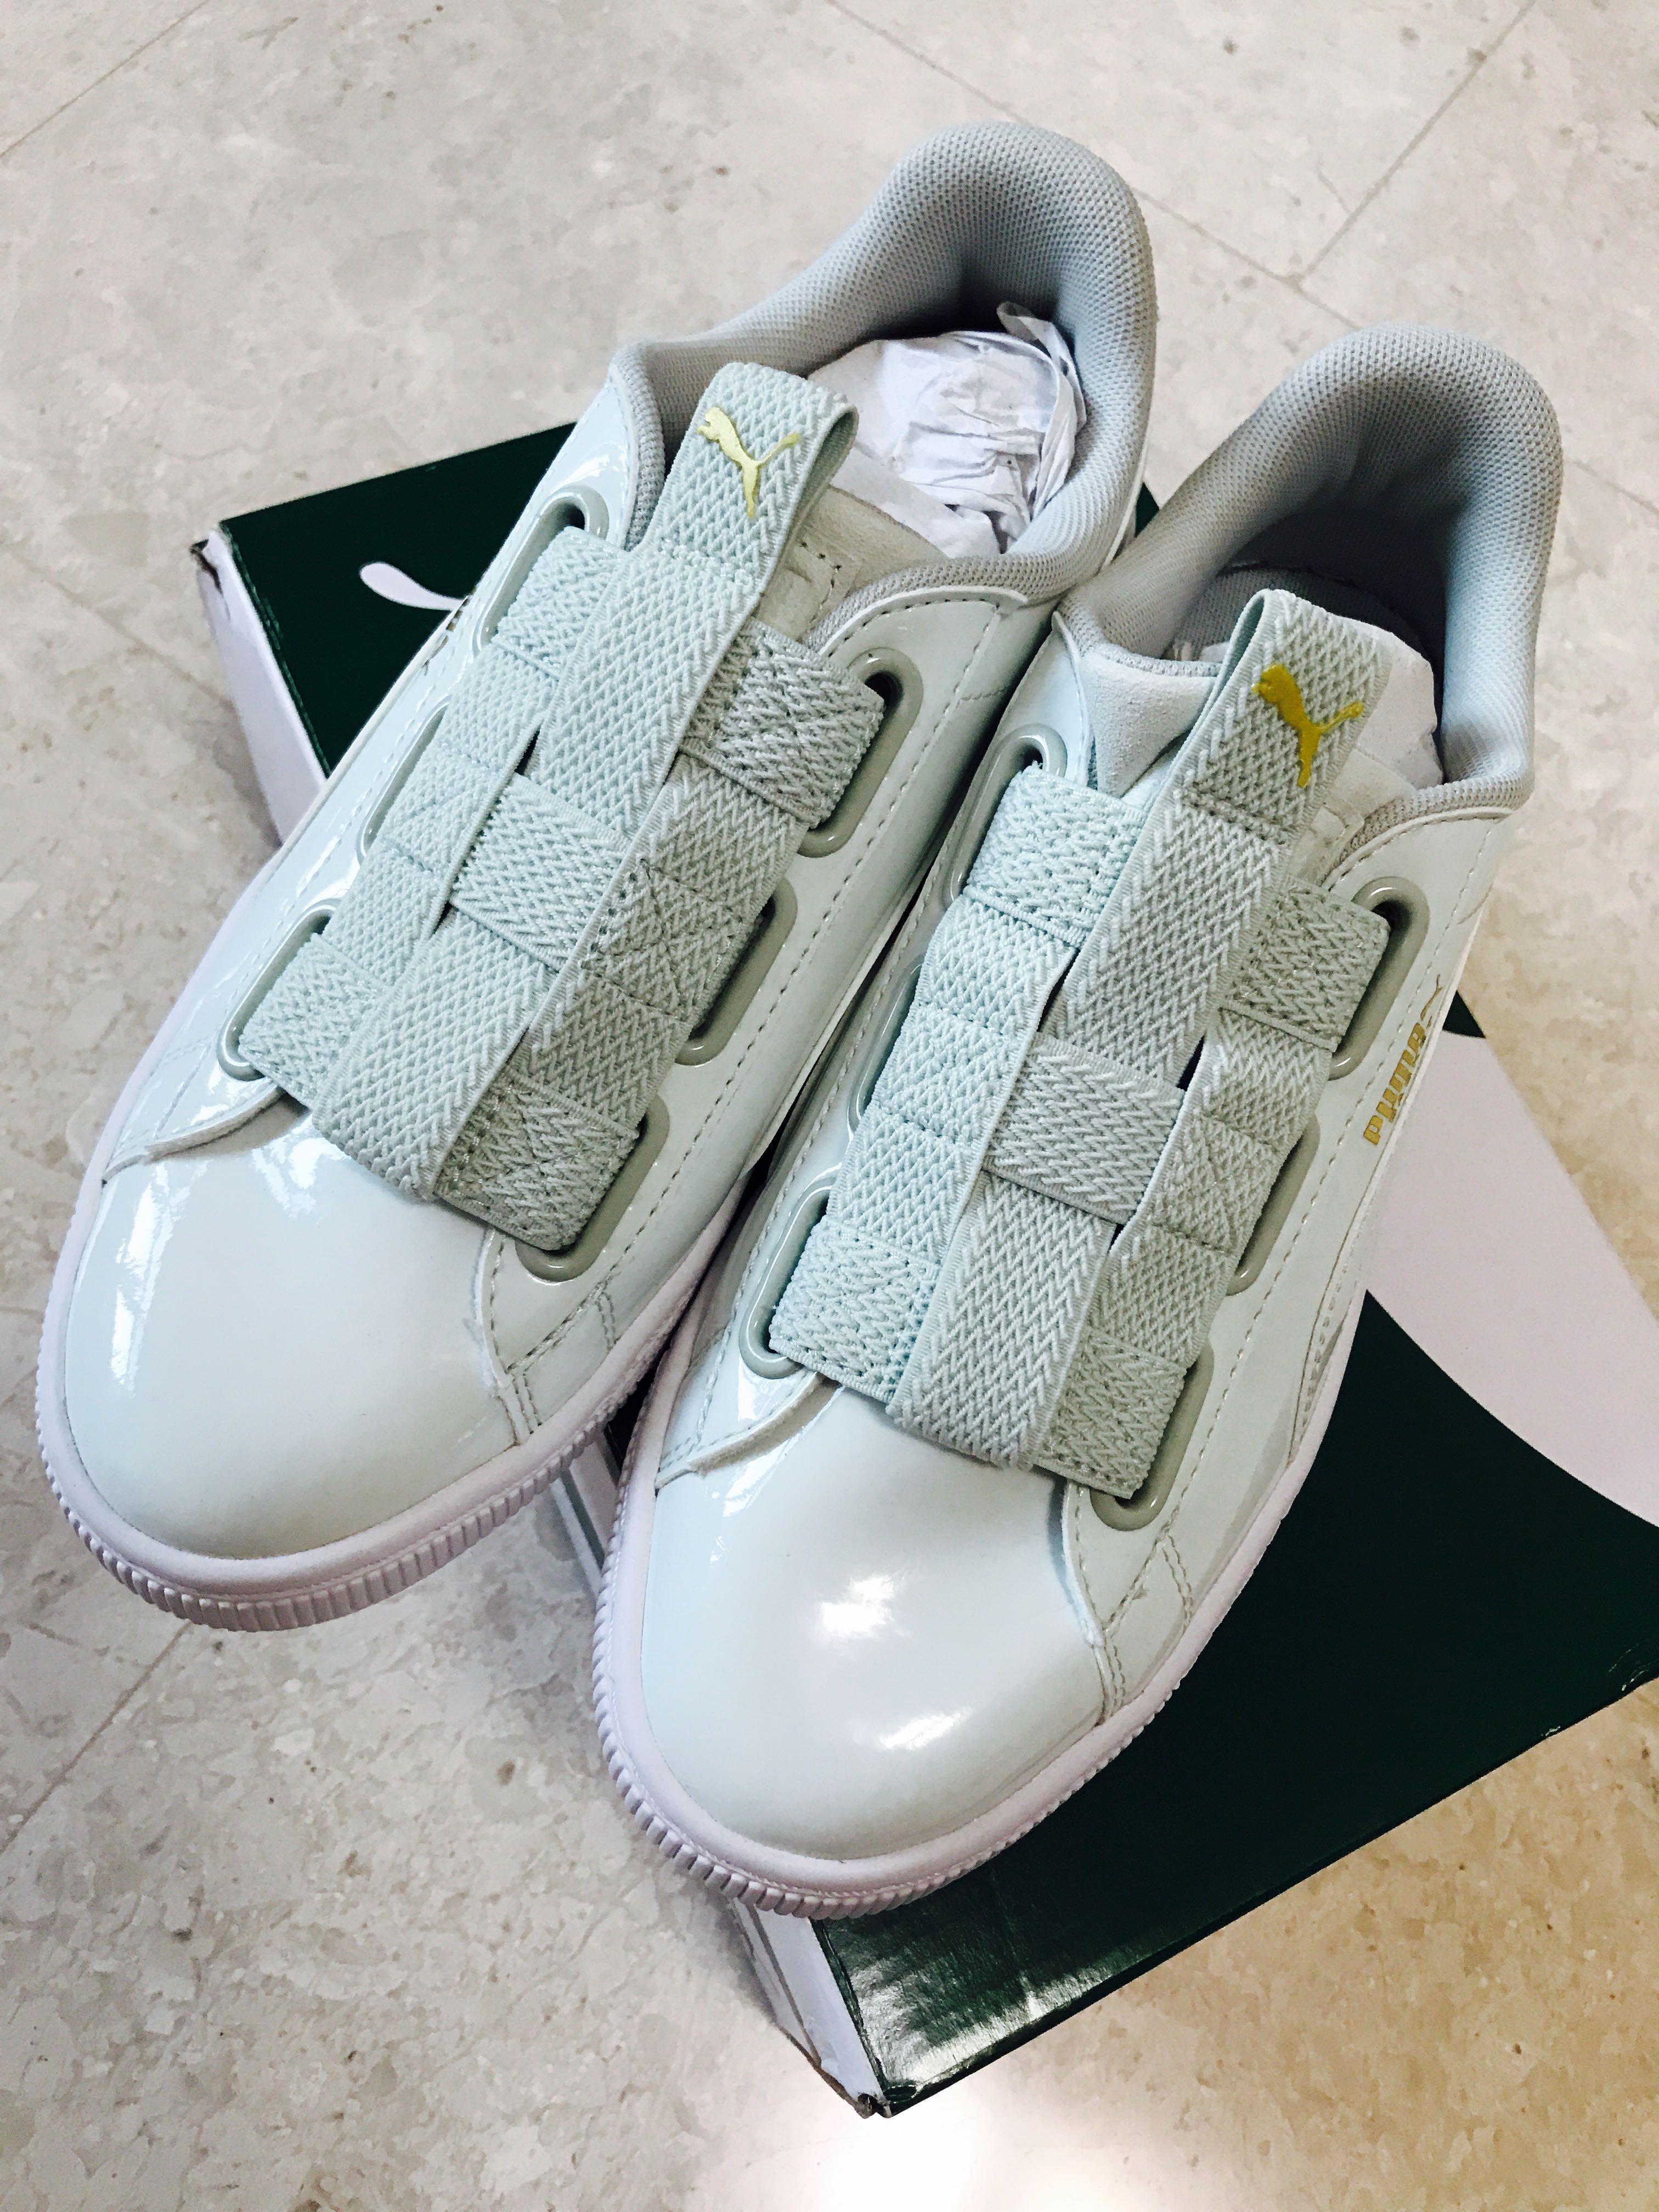 5c6bde6d20b0 Brand New Authentic Latest PUMA Basket Maze Women Sneakers - Blue Flower  Puma White (More like light mint colour) Size US 7 EU37.5